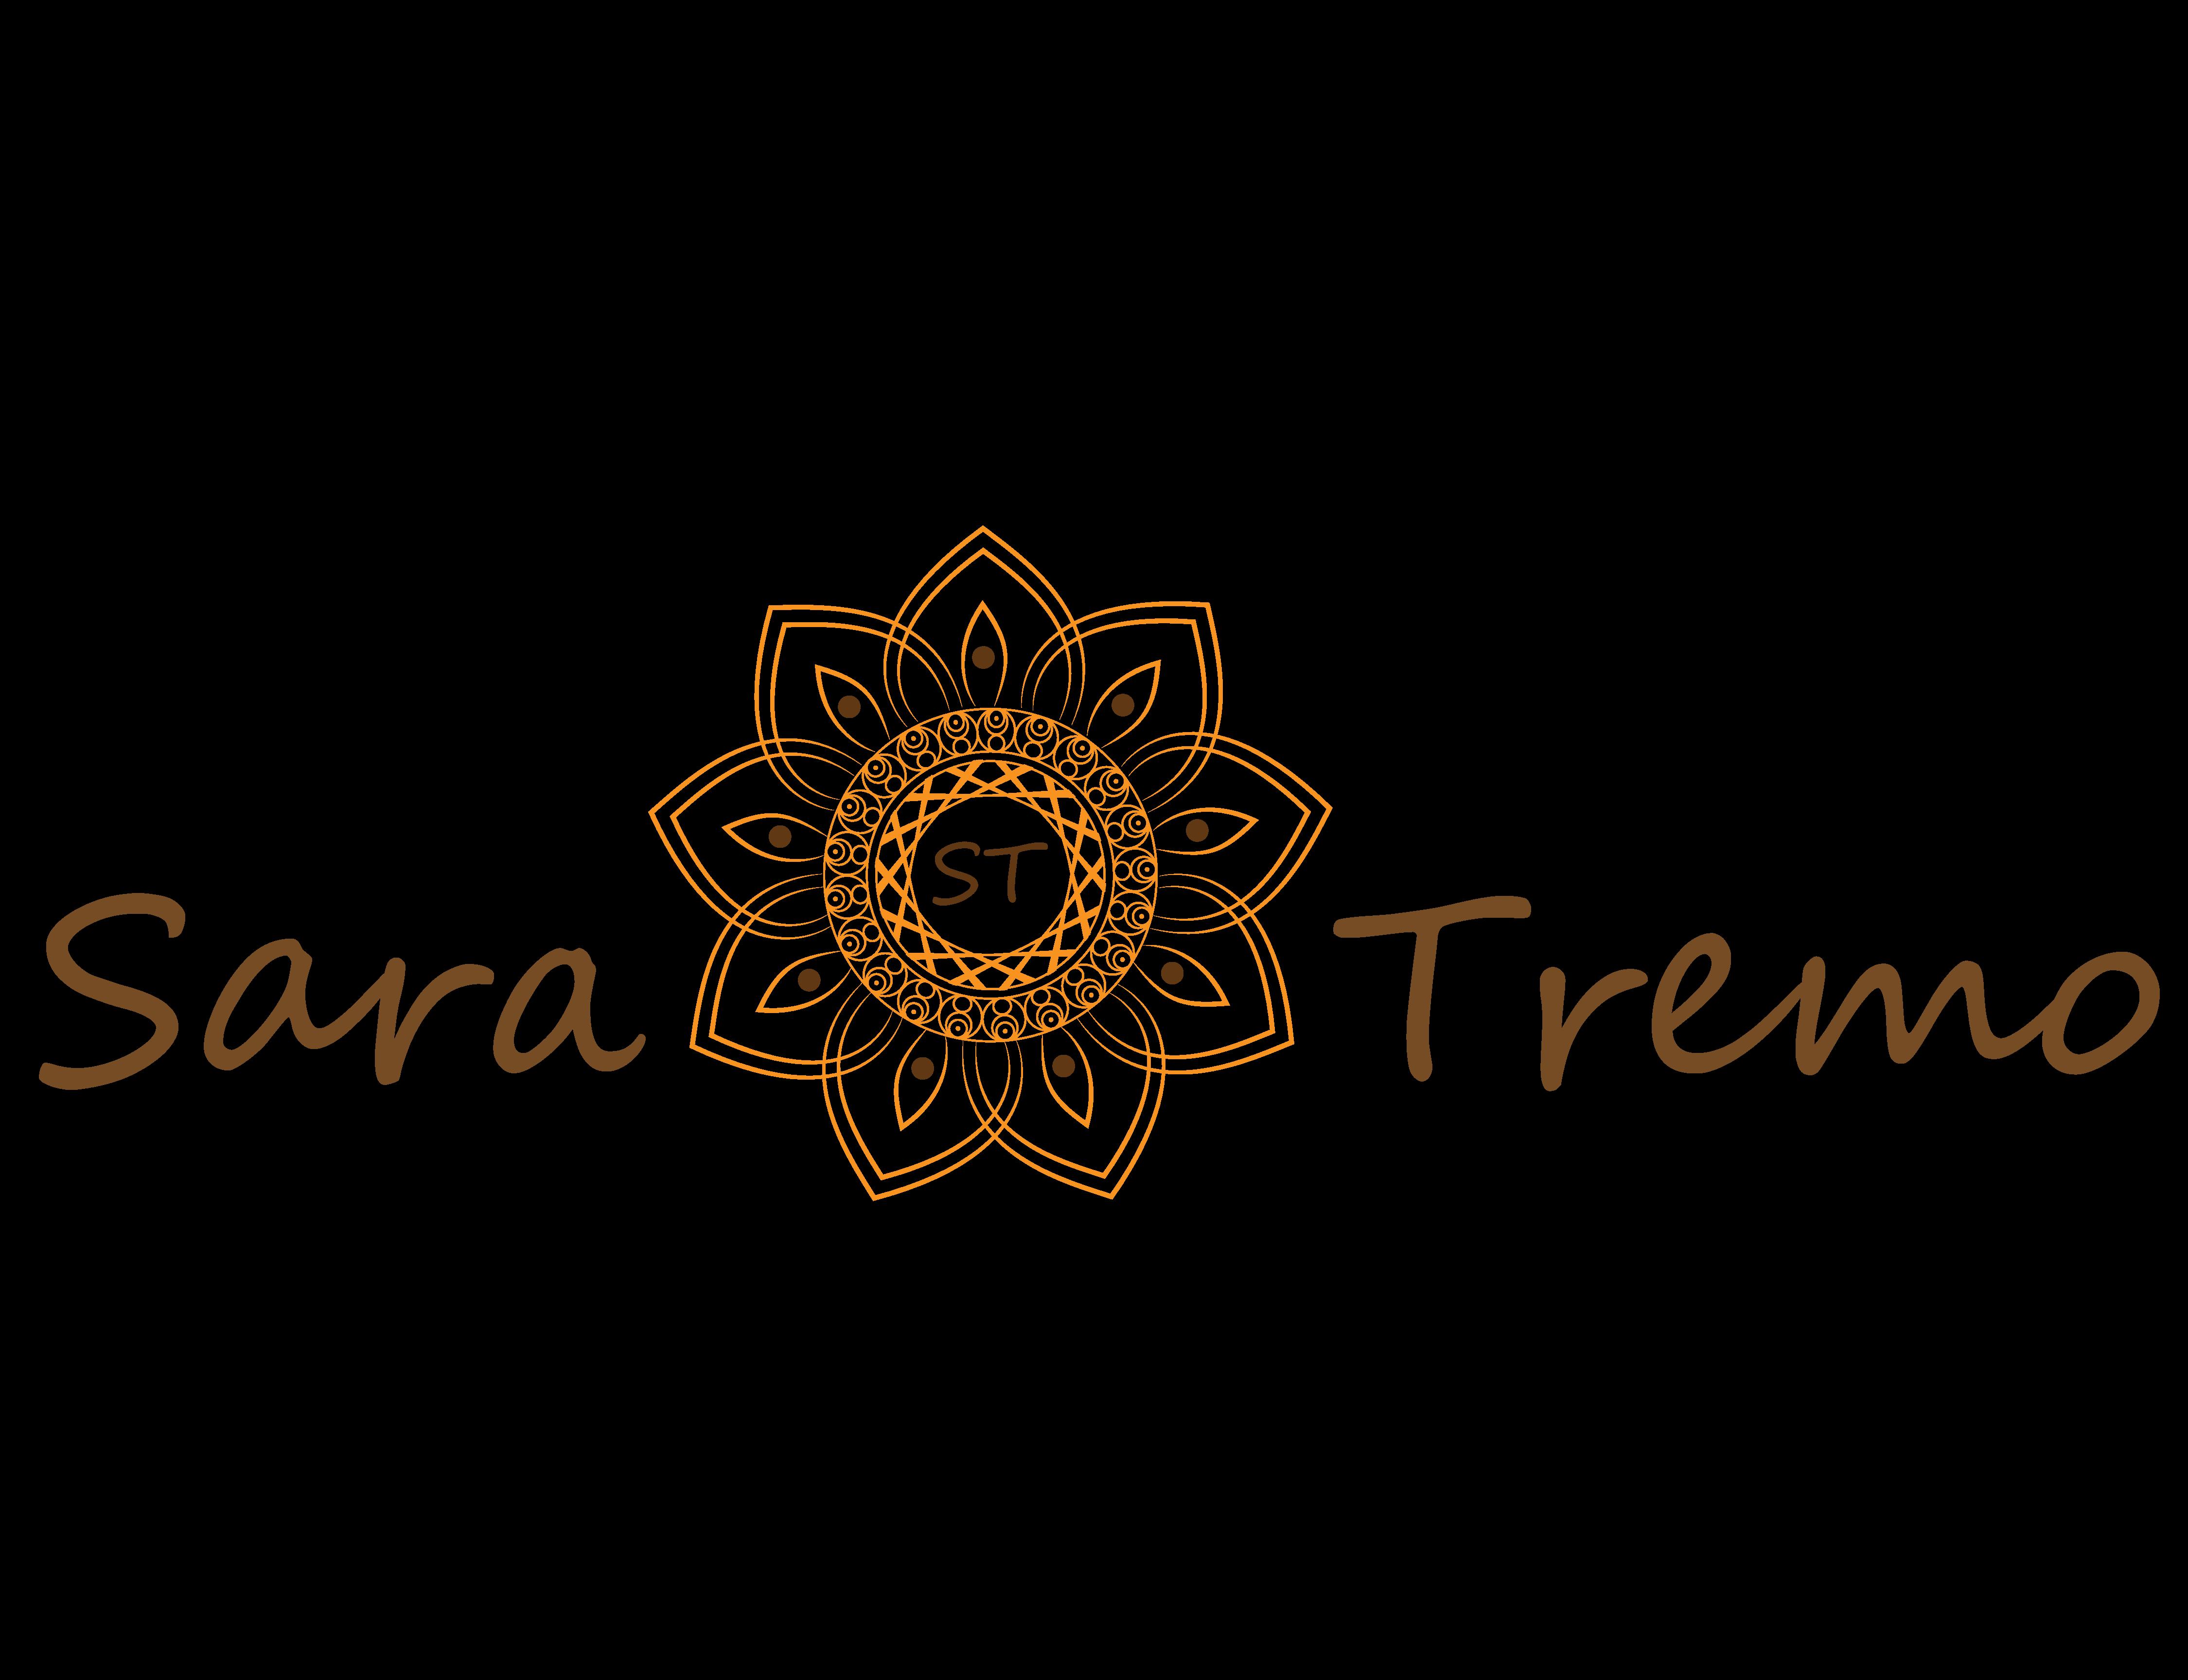 Sara Tremo